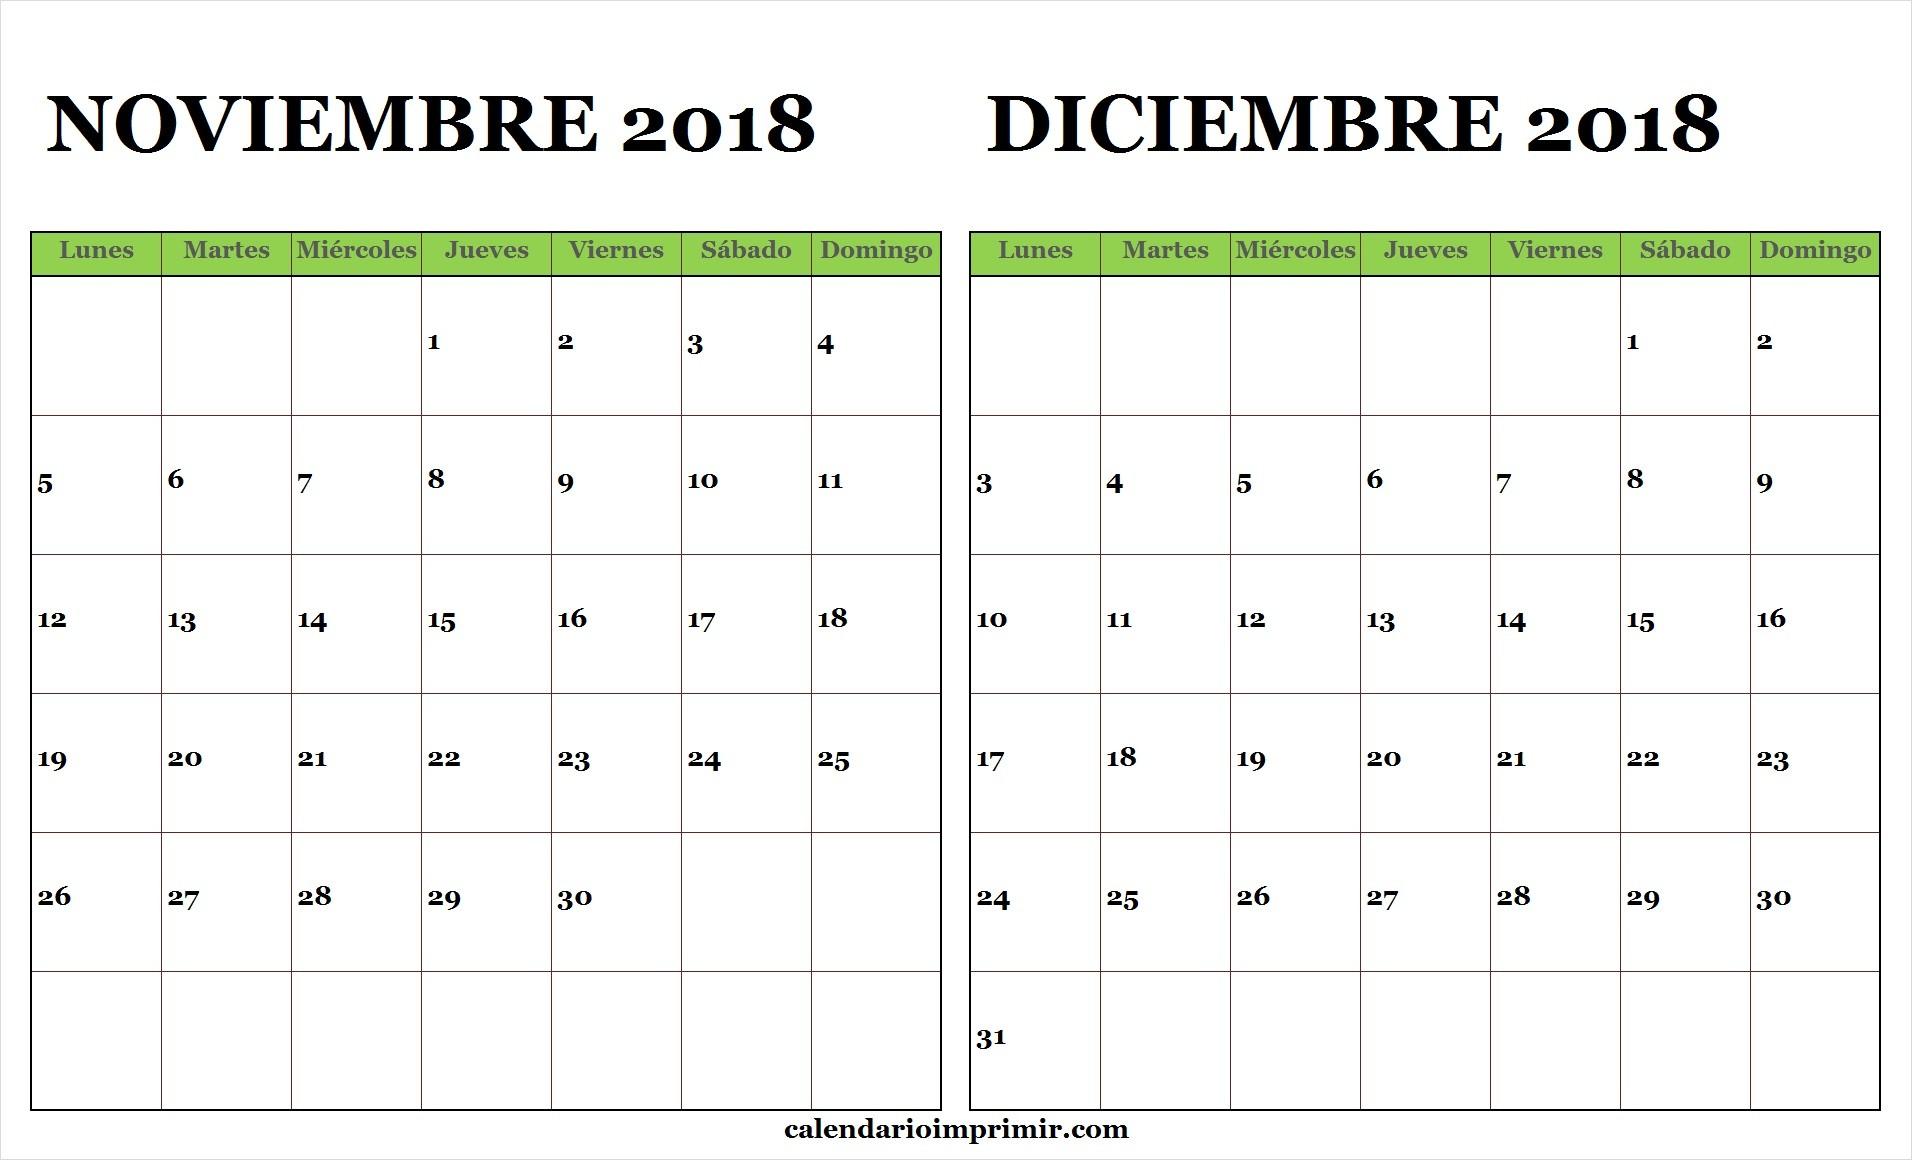 calendario noviembre diciembre 2018 lunes a domingo para imprimir